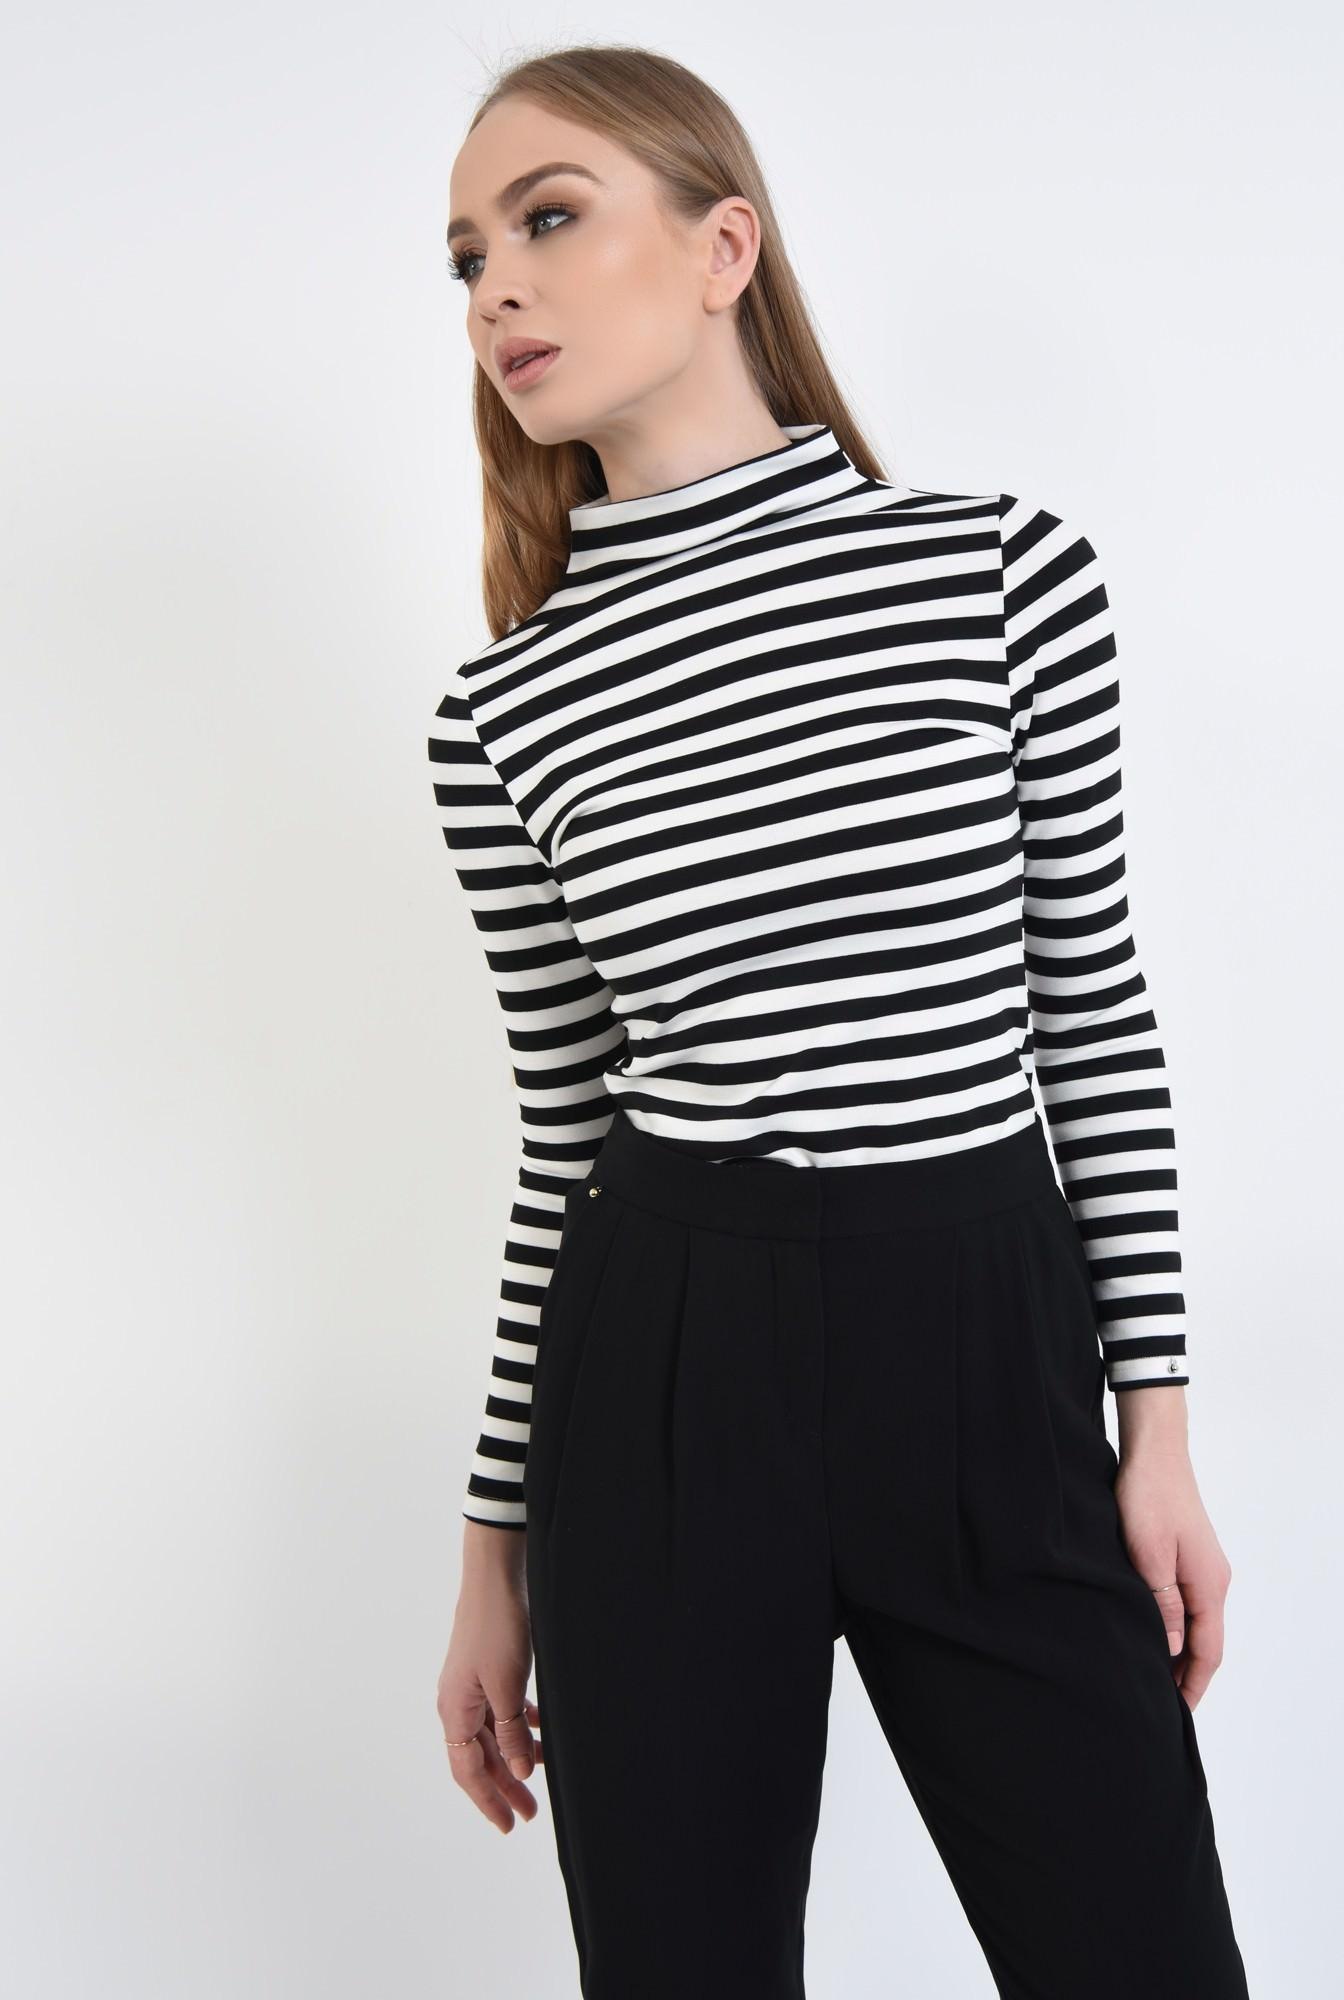 2 - Bluza casual, dungi, alb-negru